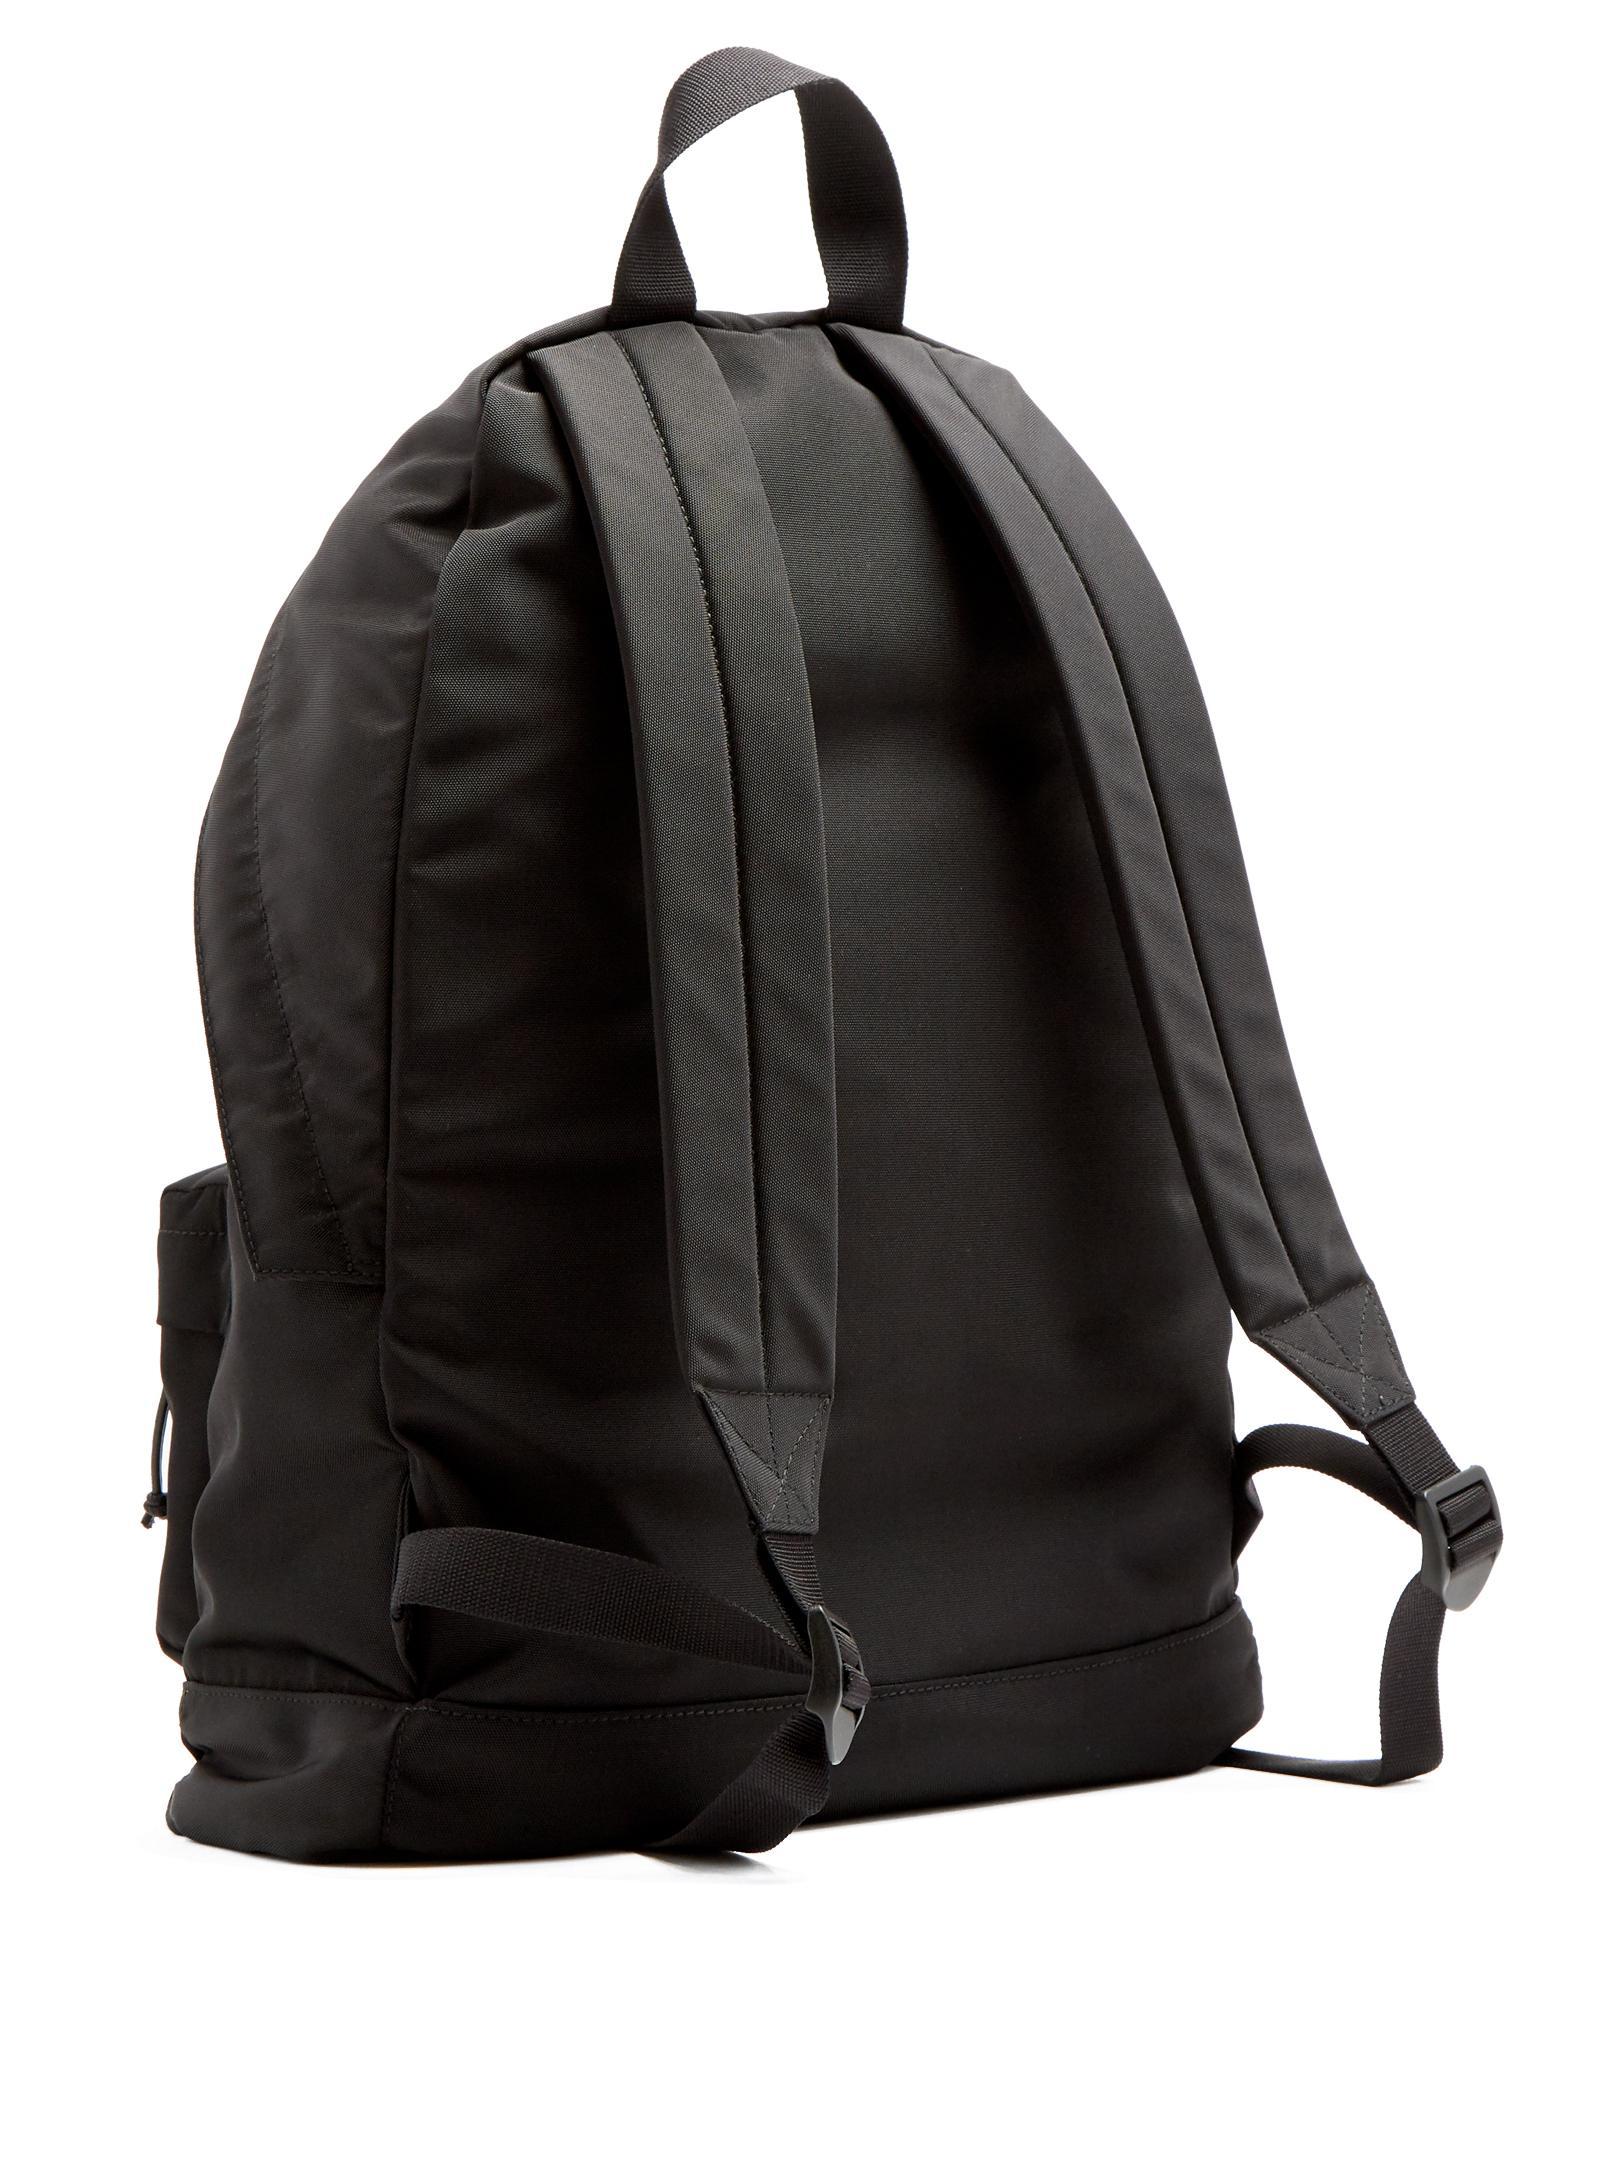 Balenciaga Logo-embroidered Canvas Backpack in Black for Men